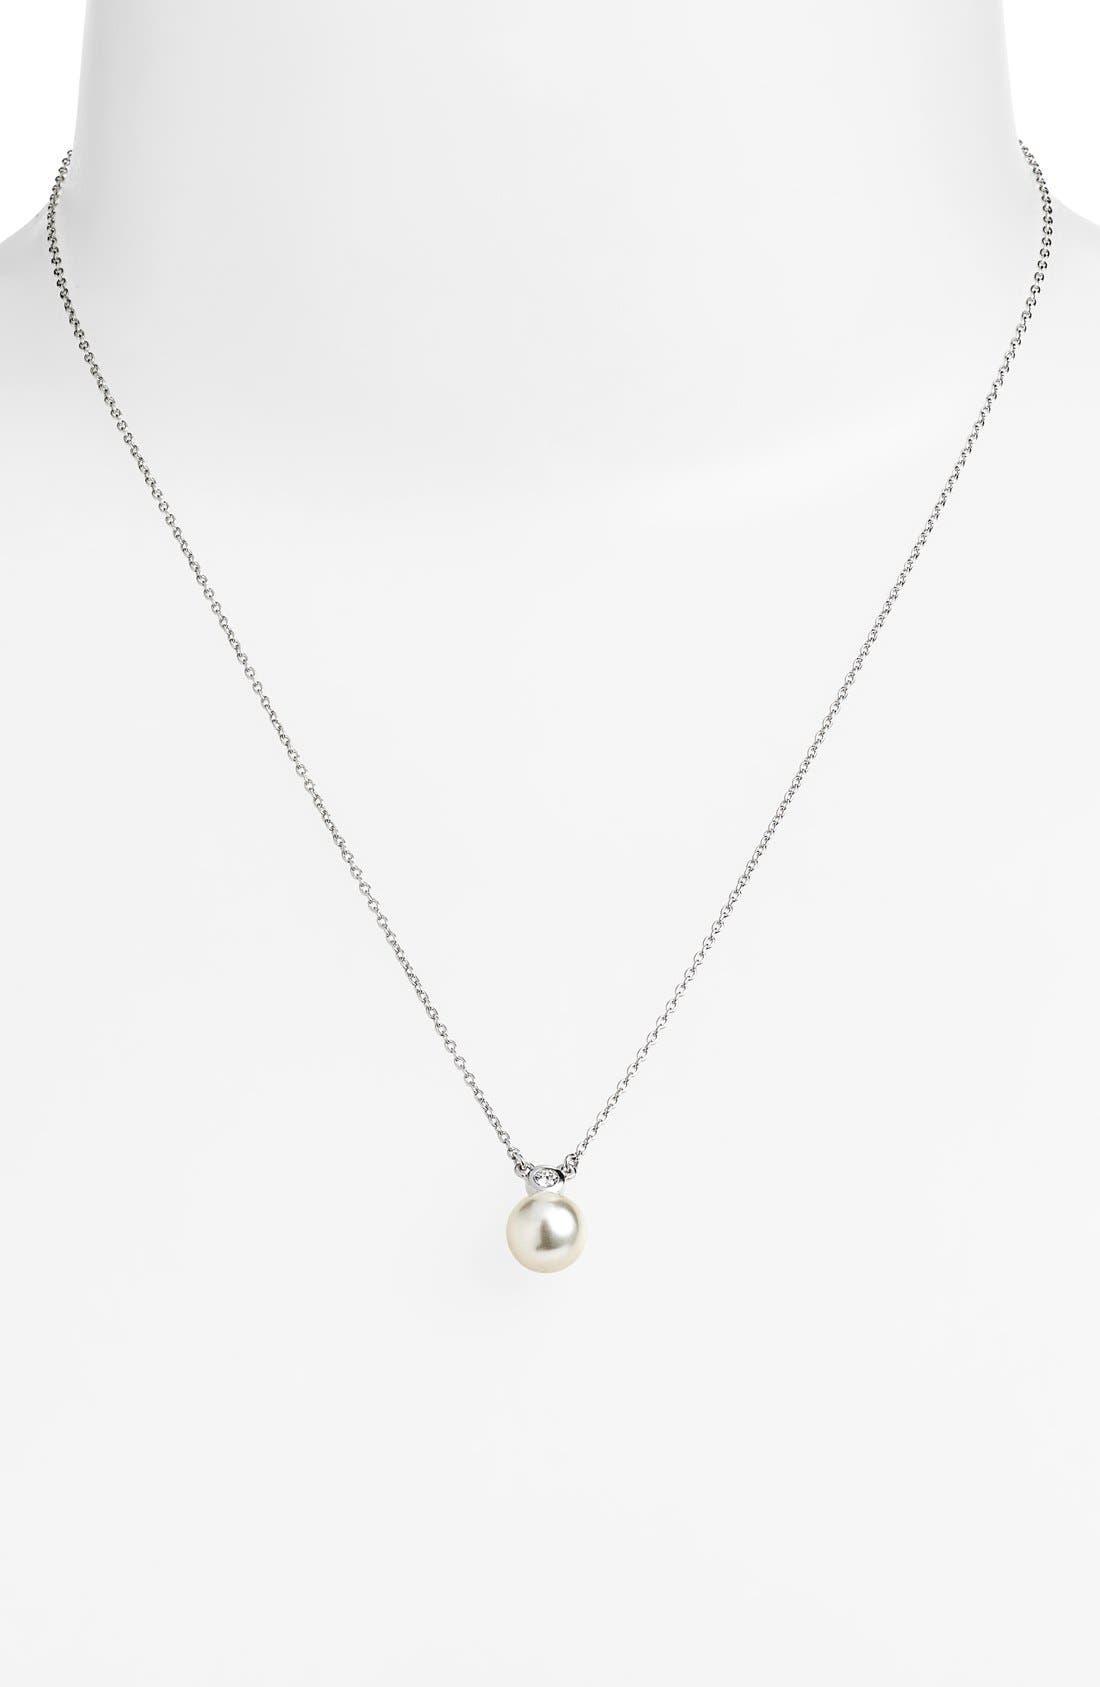 Main Image - Judith Jack 'Pearl Romance' Faux Pearl Pendant Necklace